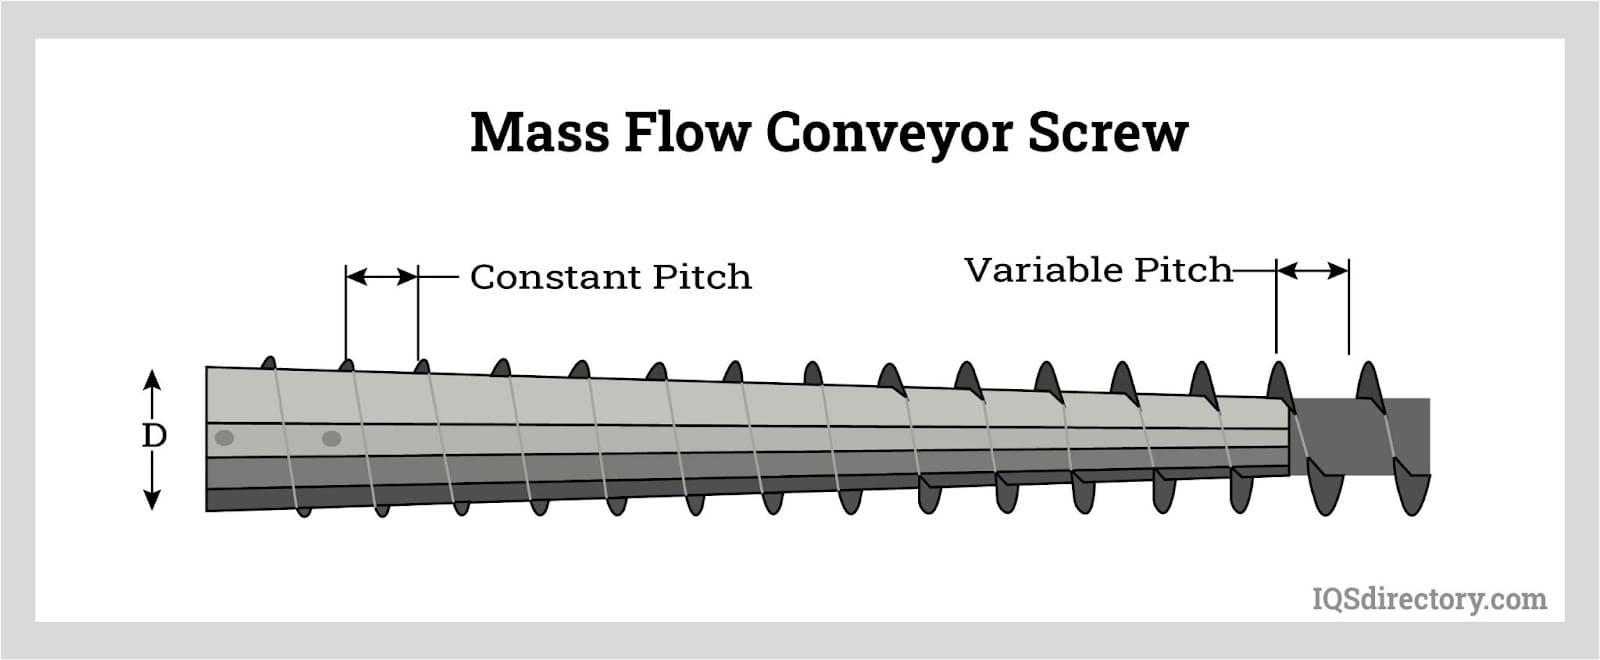 Mass Flow Conveyor Screw